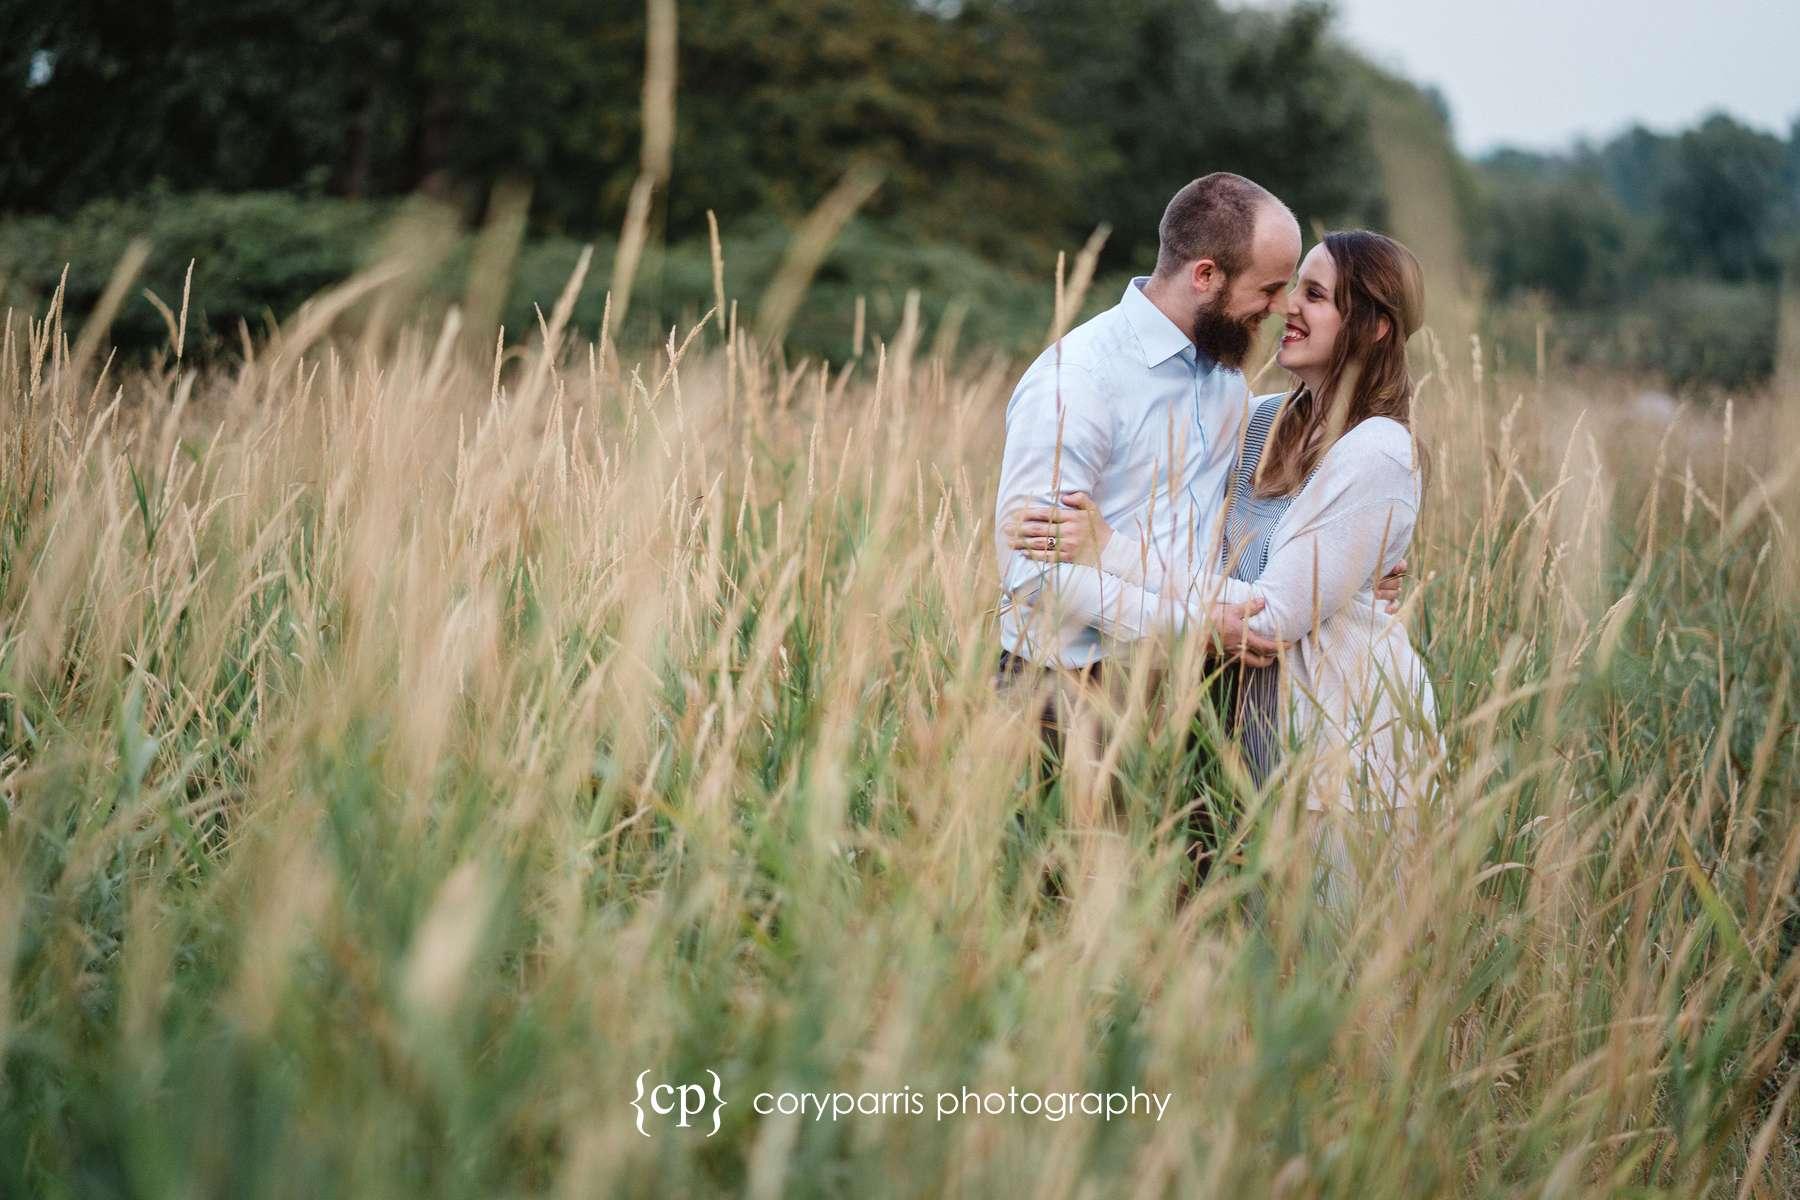 051-Engagement-Portraits-Marrymoor-Park.jpg